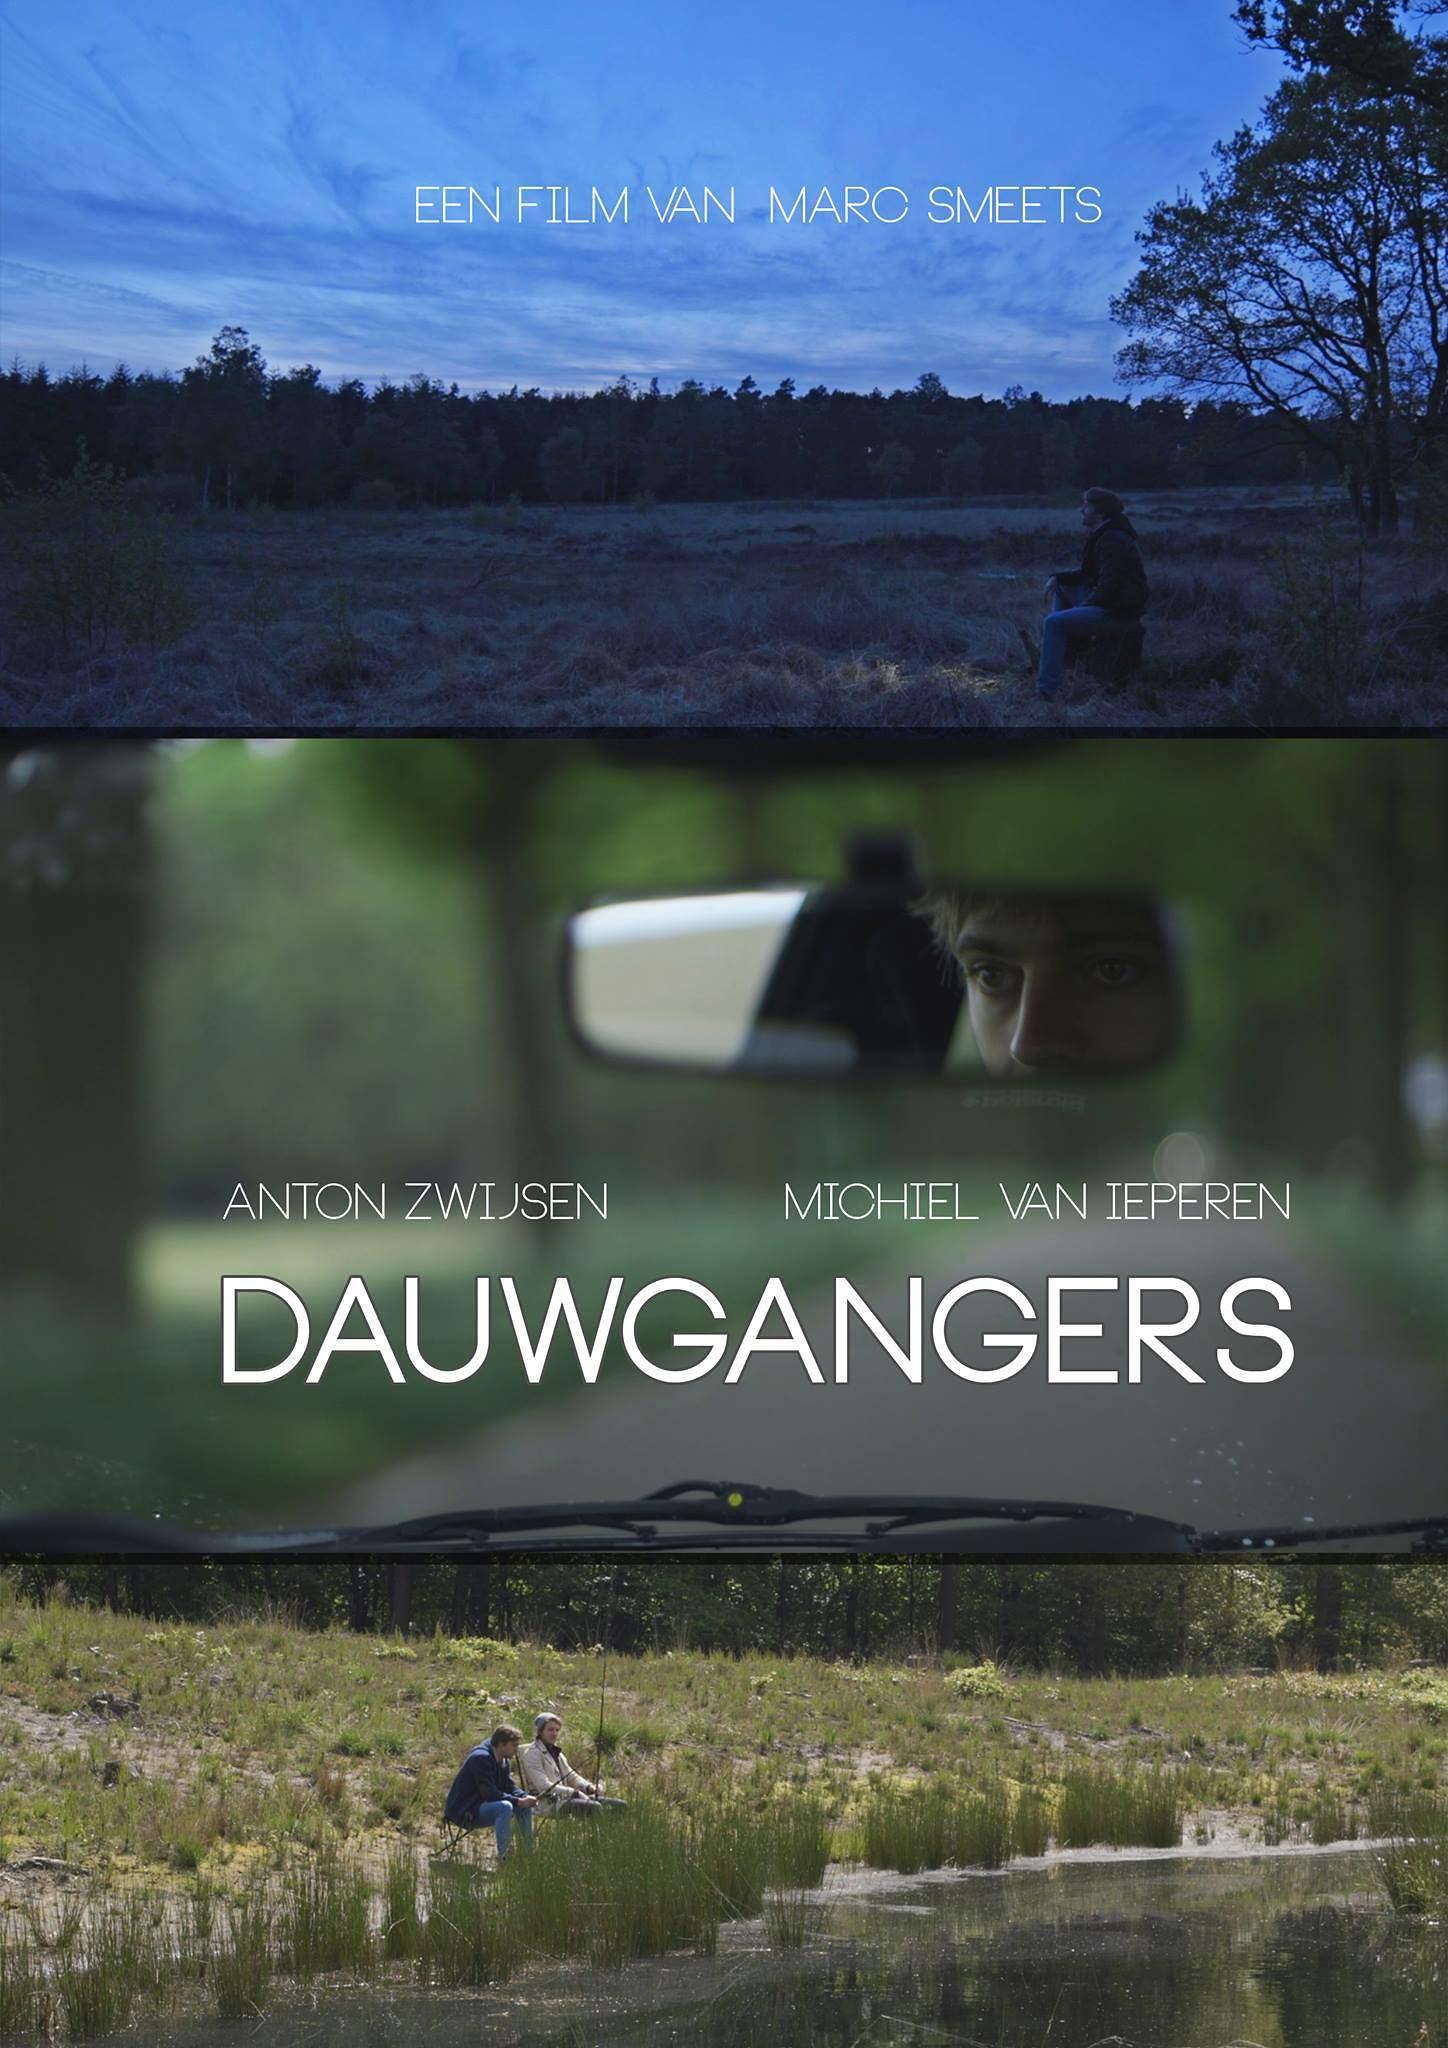 Dauwgangers Movie Poster